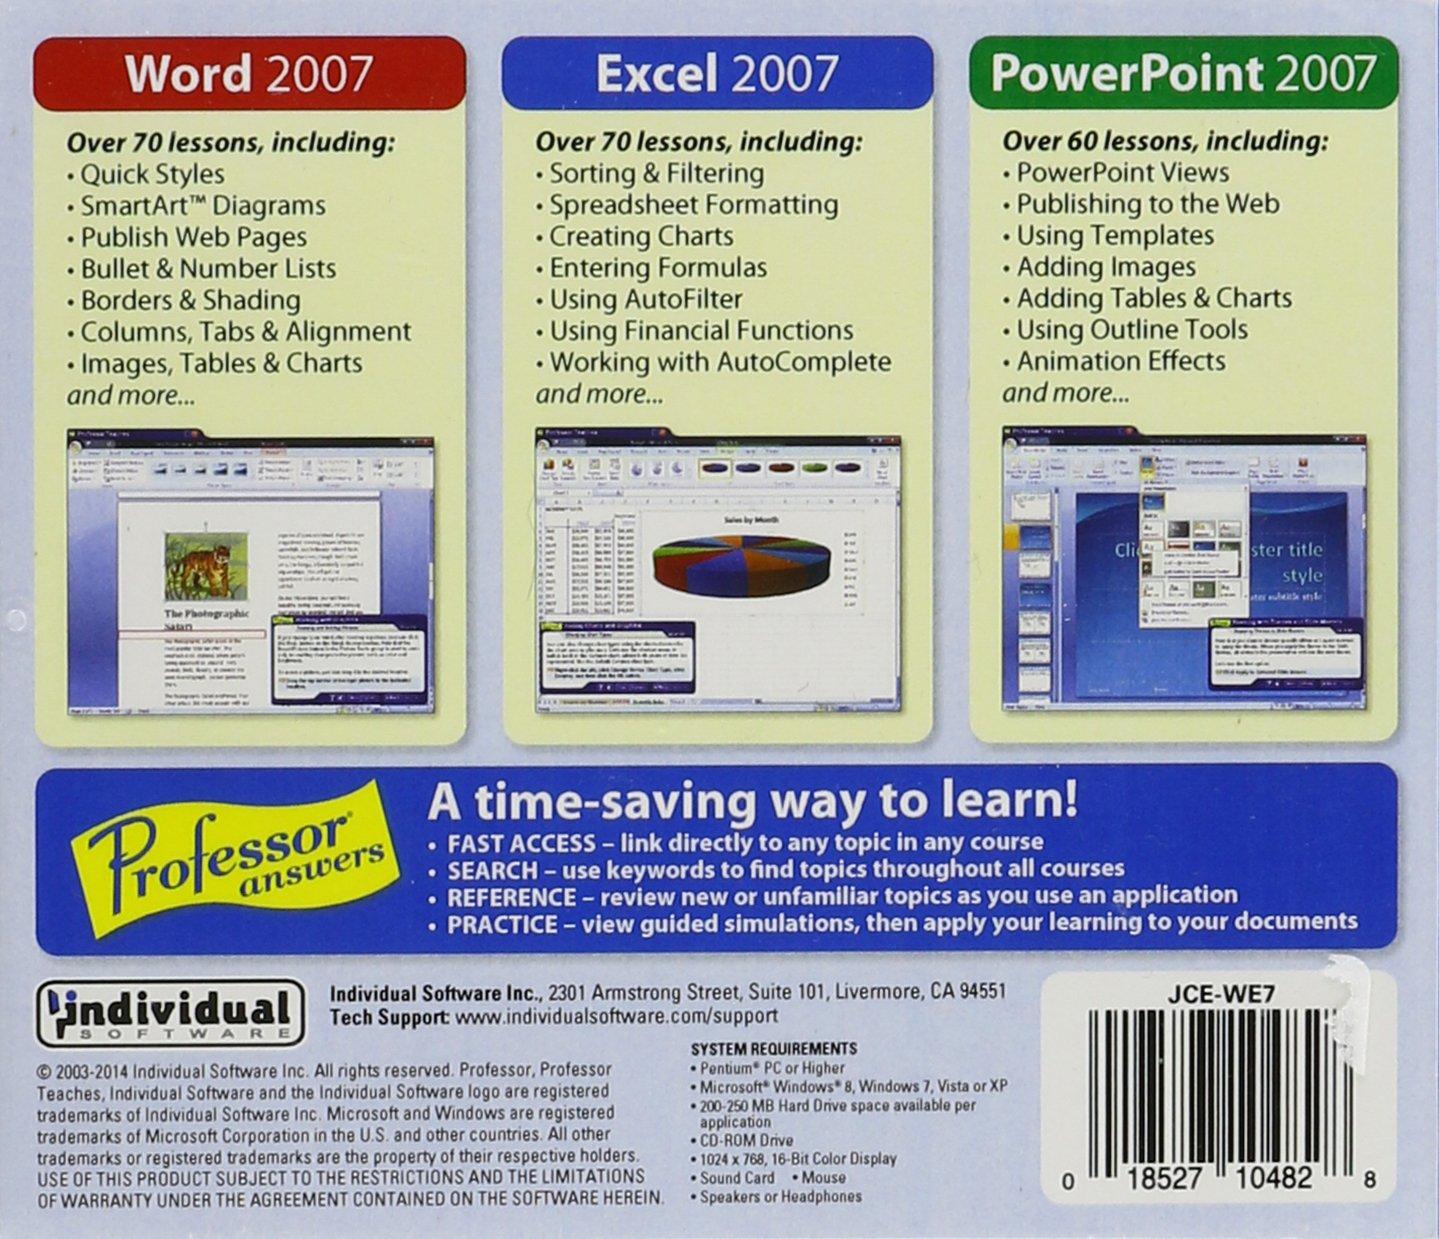 Running windows vista and microsoft office including powerpoint - Running Windows Vista And Microsoft Office Including Powerpoint 68